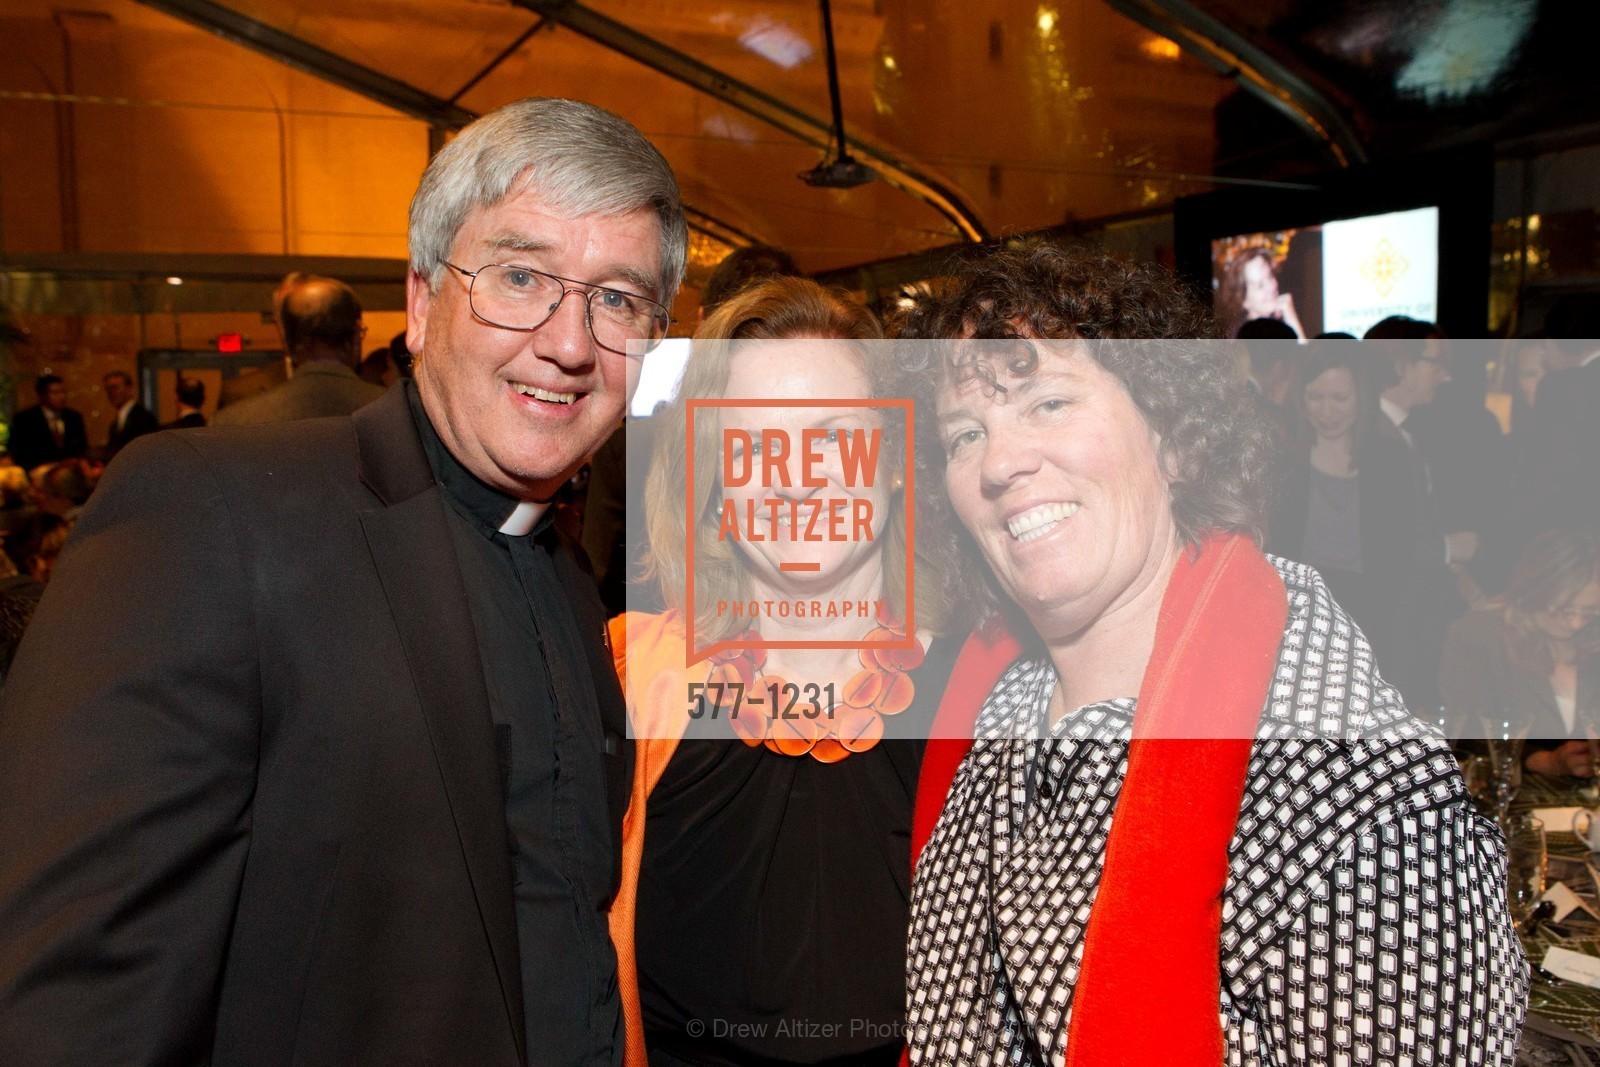 Father John Koeplin, Erin Doyle Ebeling, Tracey McNamara, Photo #577-1231